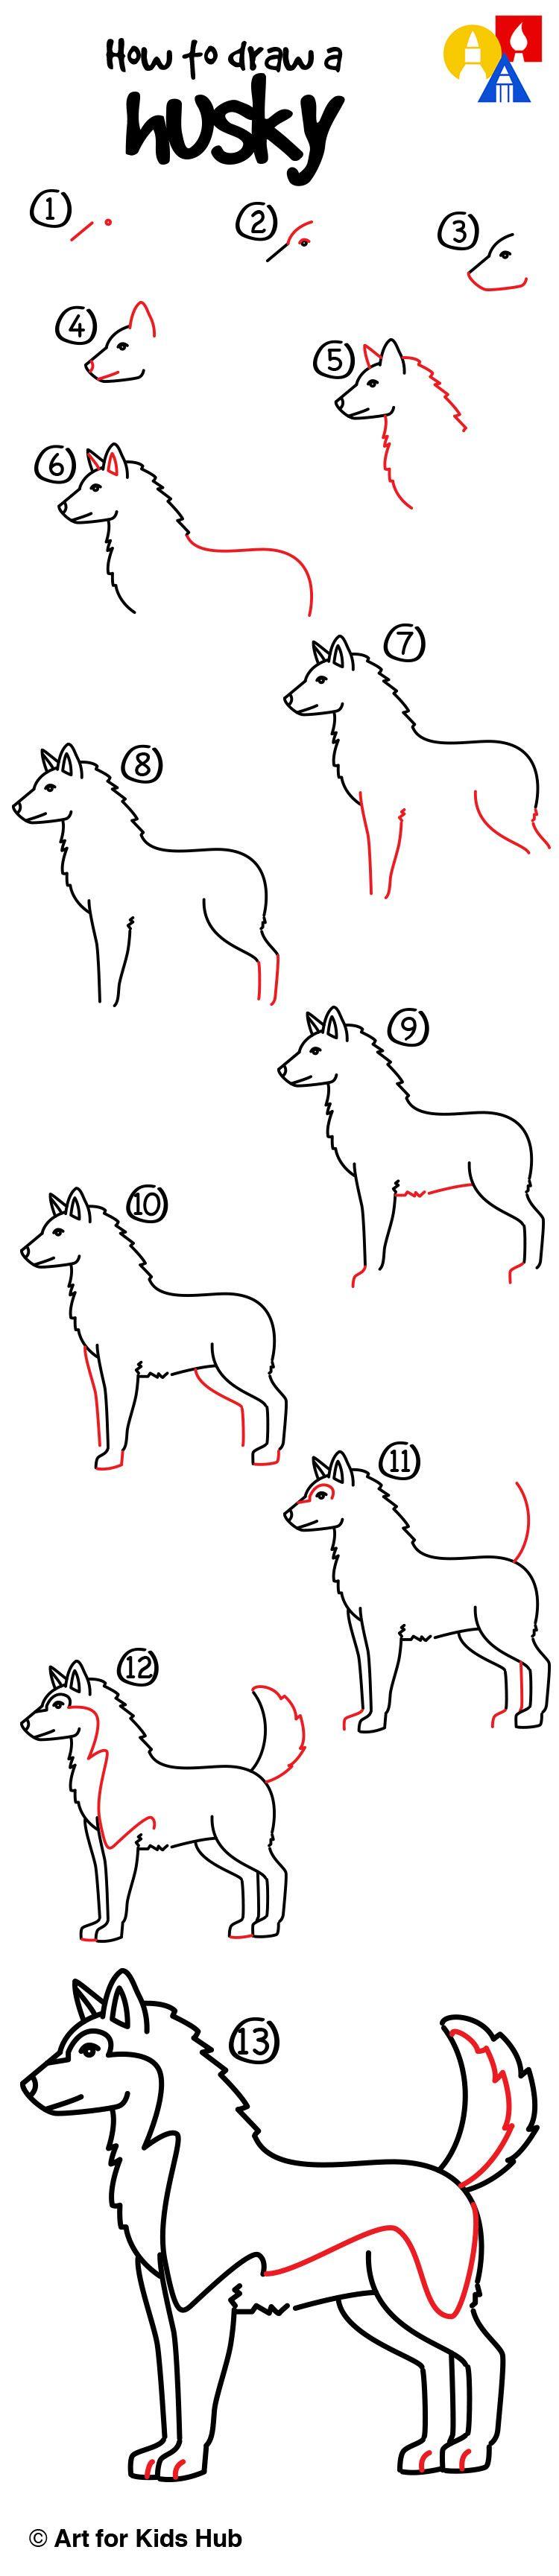 How To Draw A Realistic Husky  Art For Kids Hub